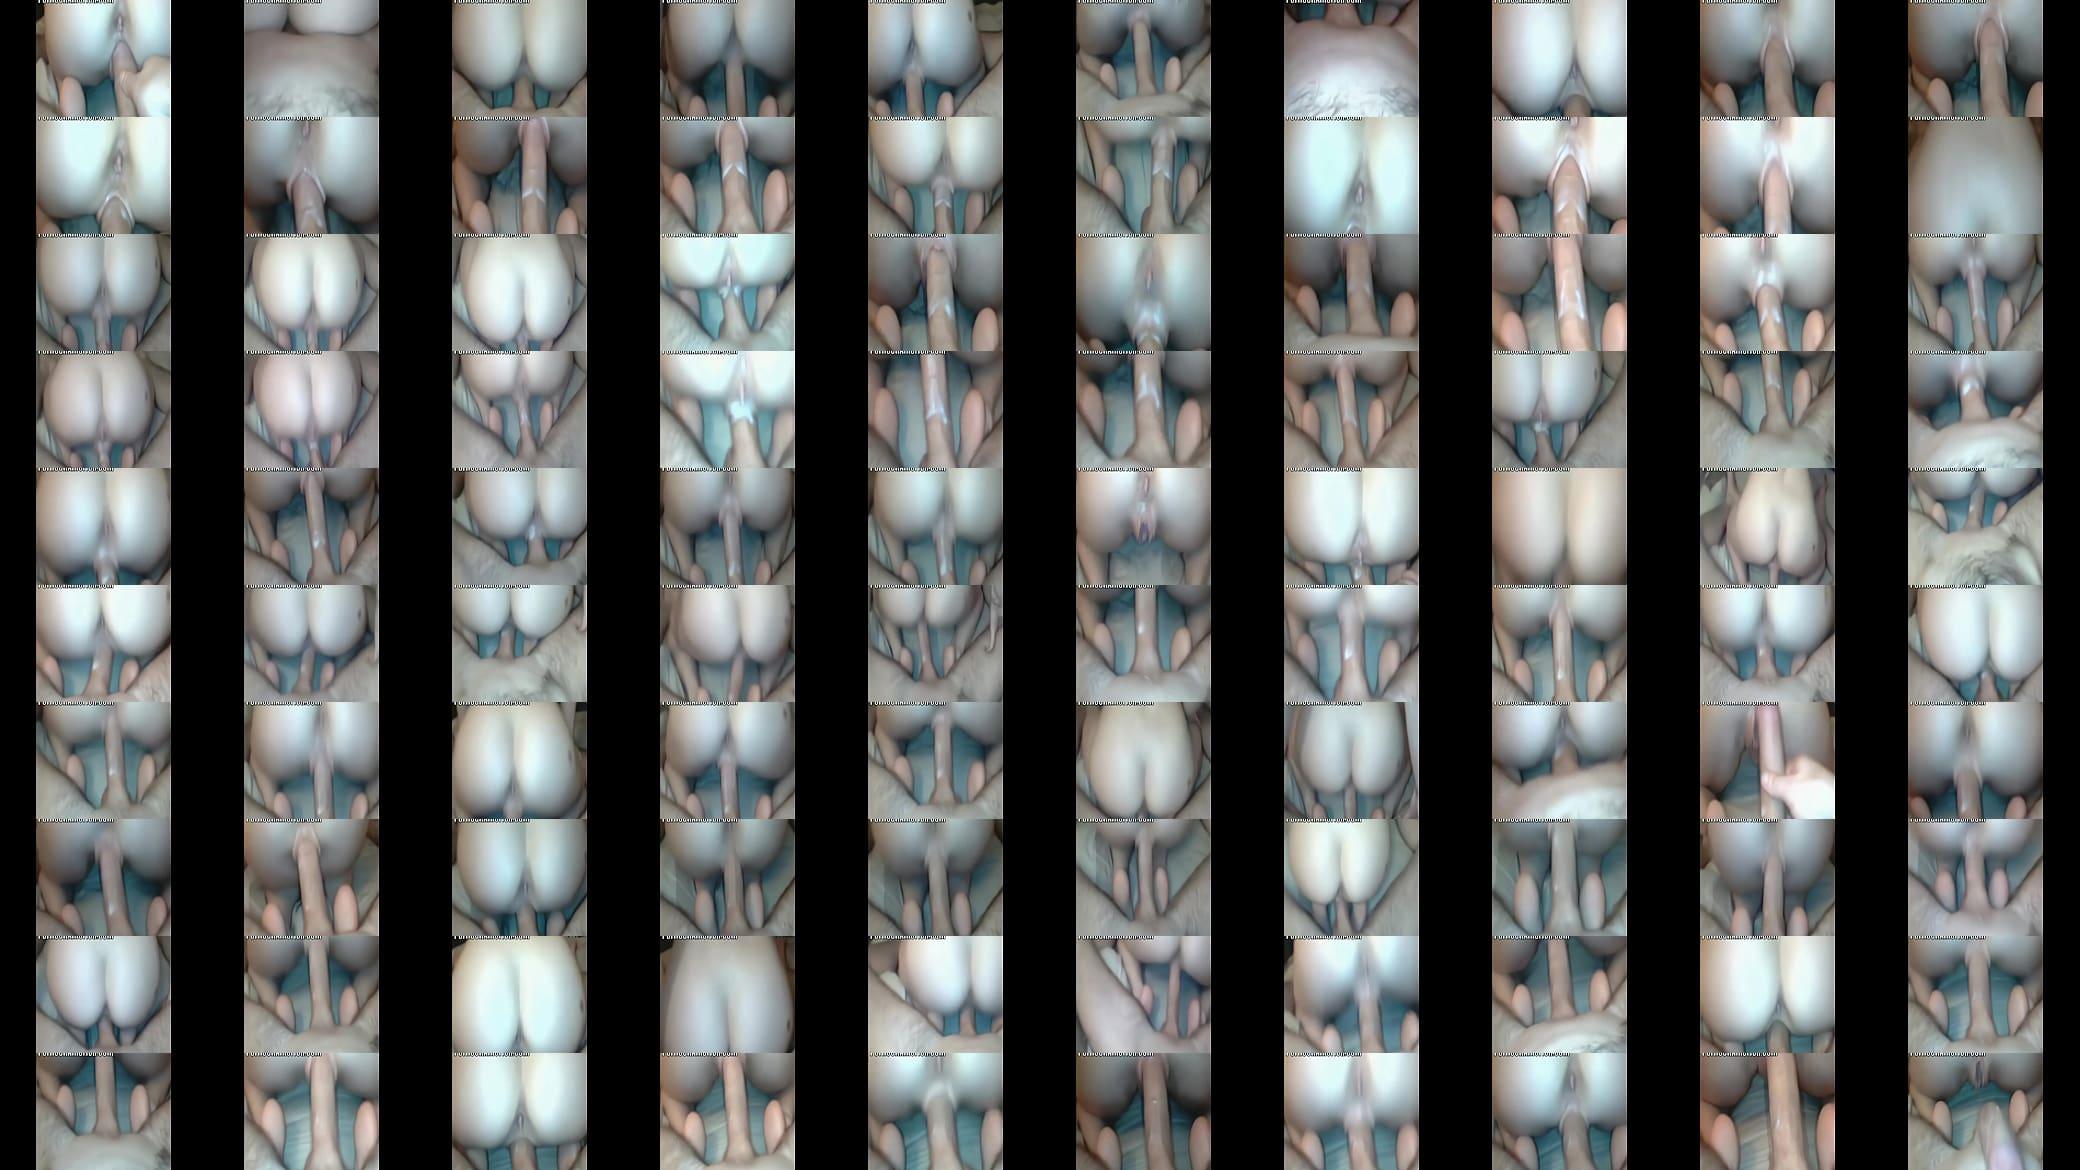 Paginas De Porno Latino videos de porno latino en - pornoenamerica - pagina de